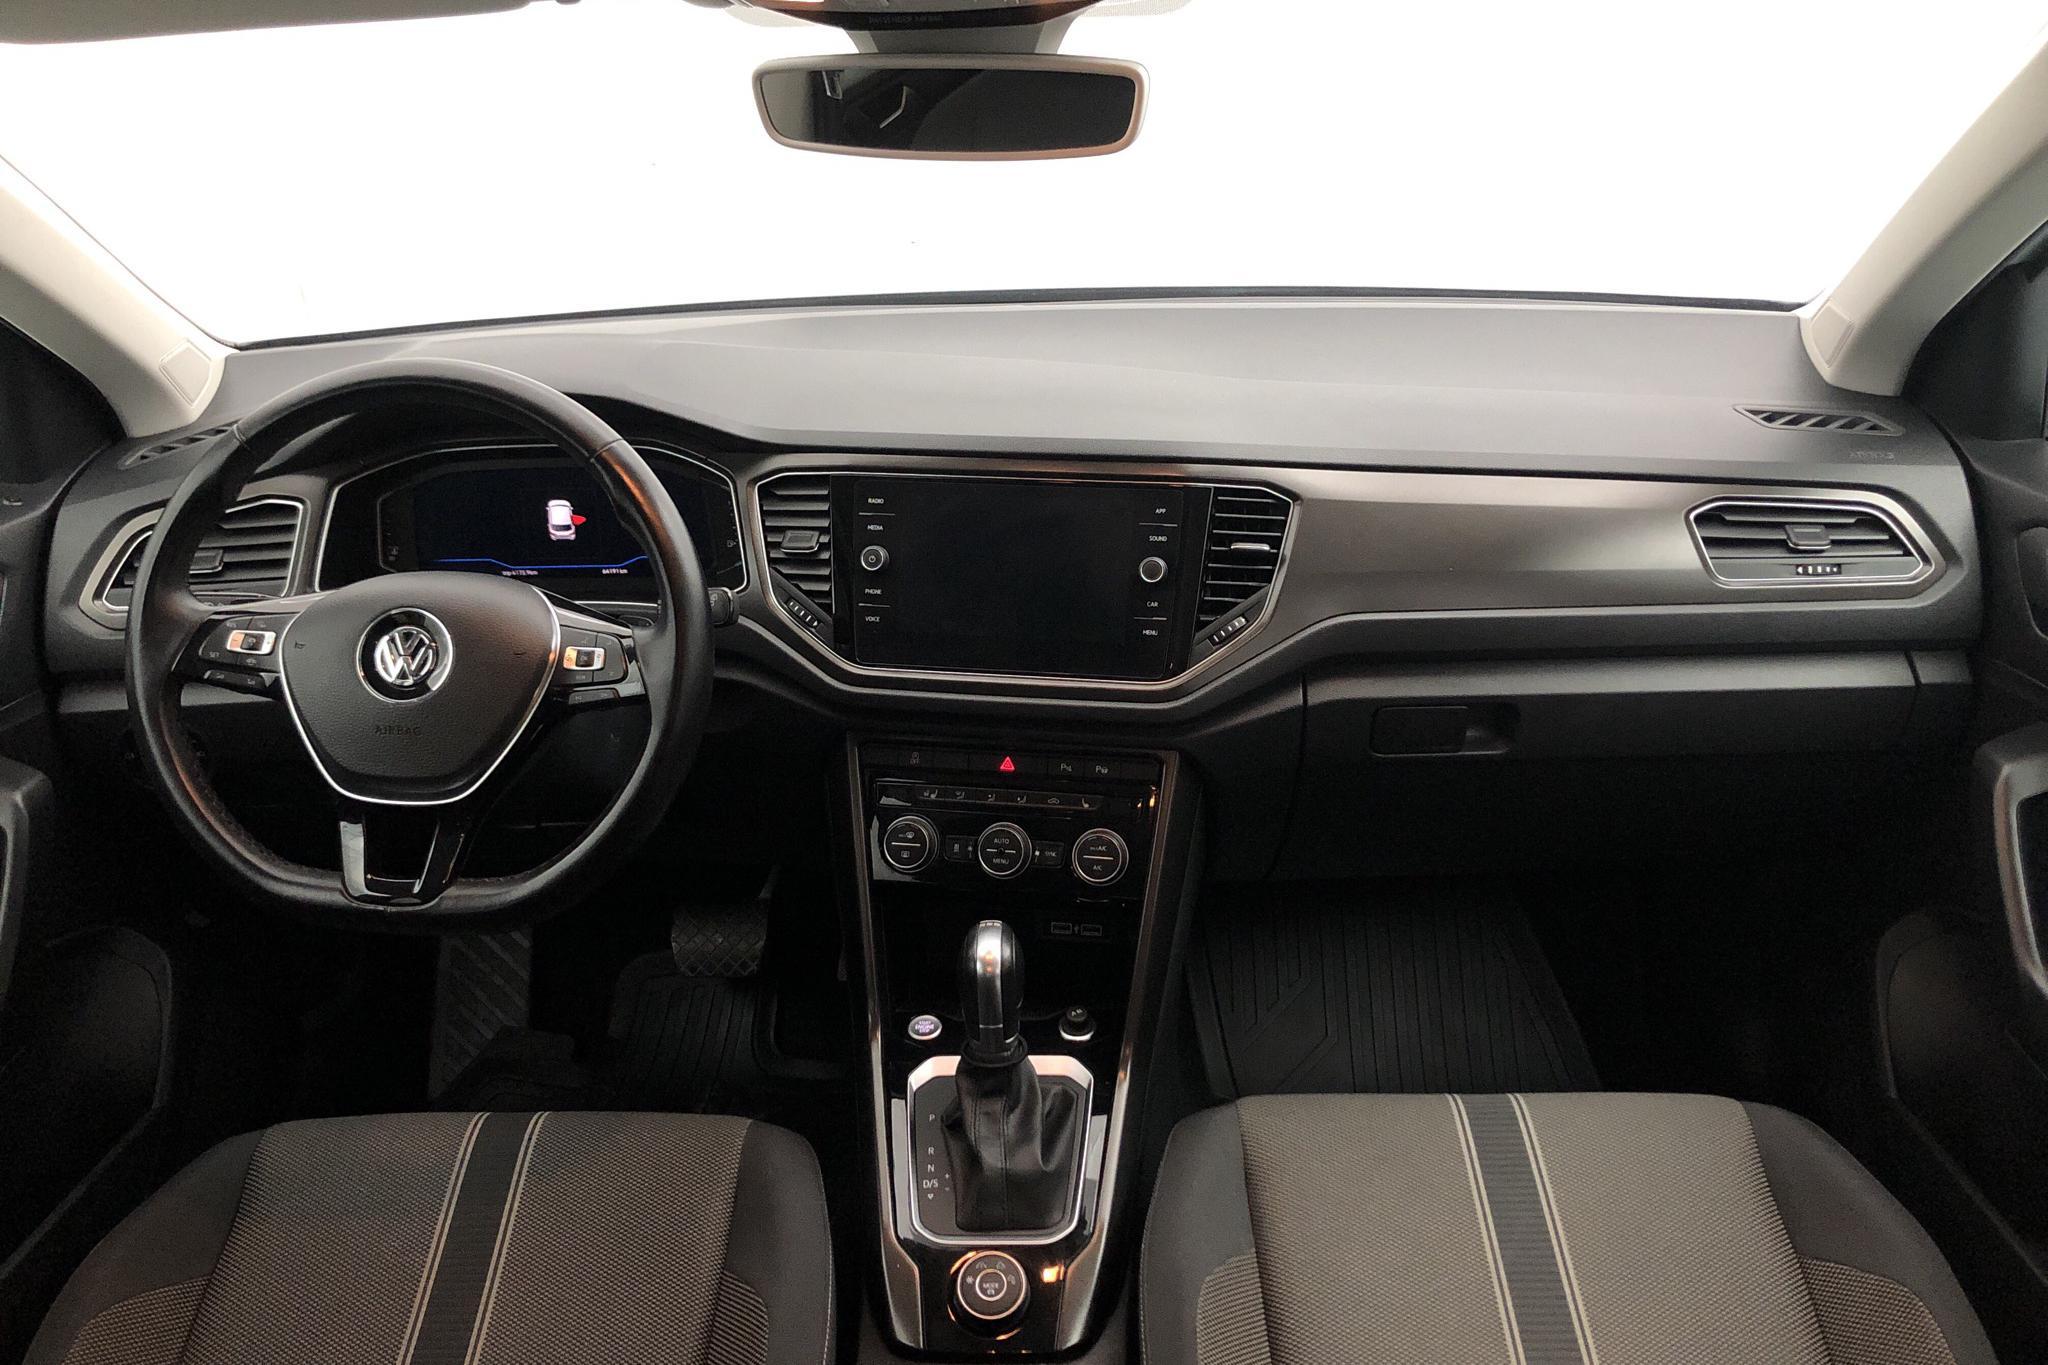 VW T-Roc 2.0 TSI 4MOTION (190hk) - 6 419 mil - Automat - vit - 2019